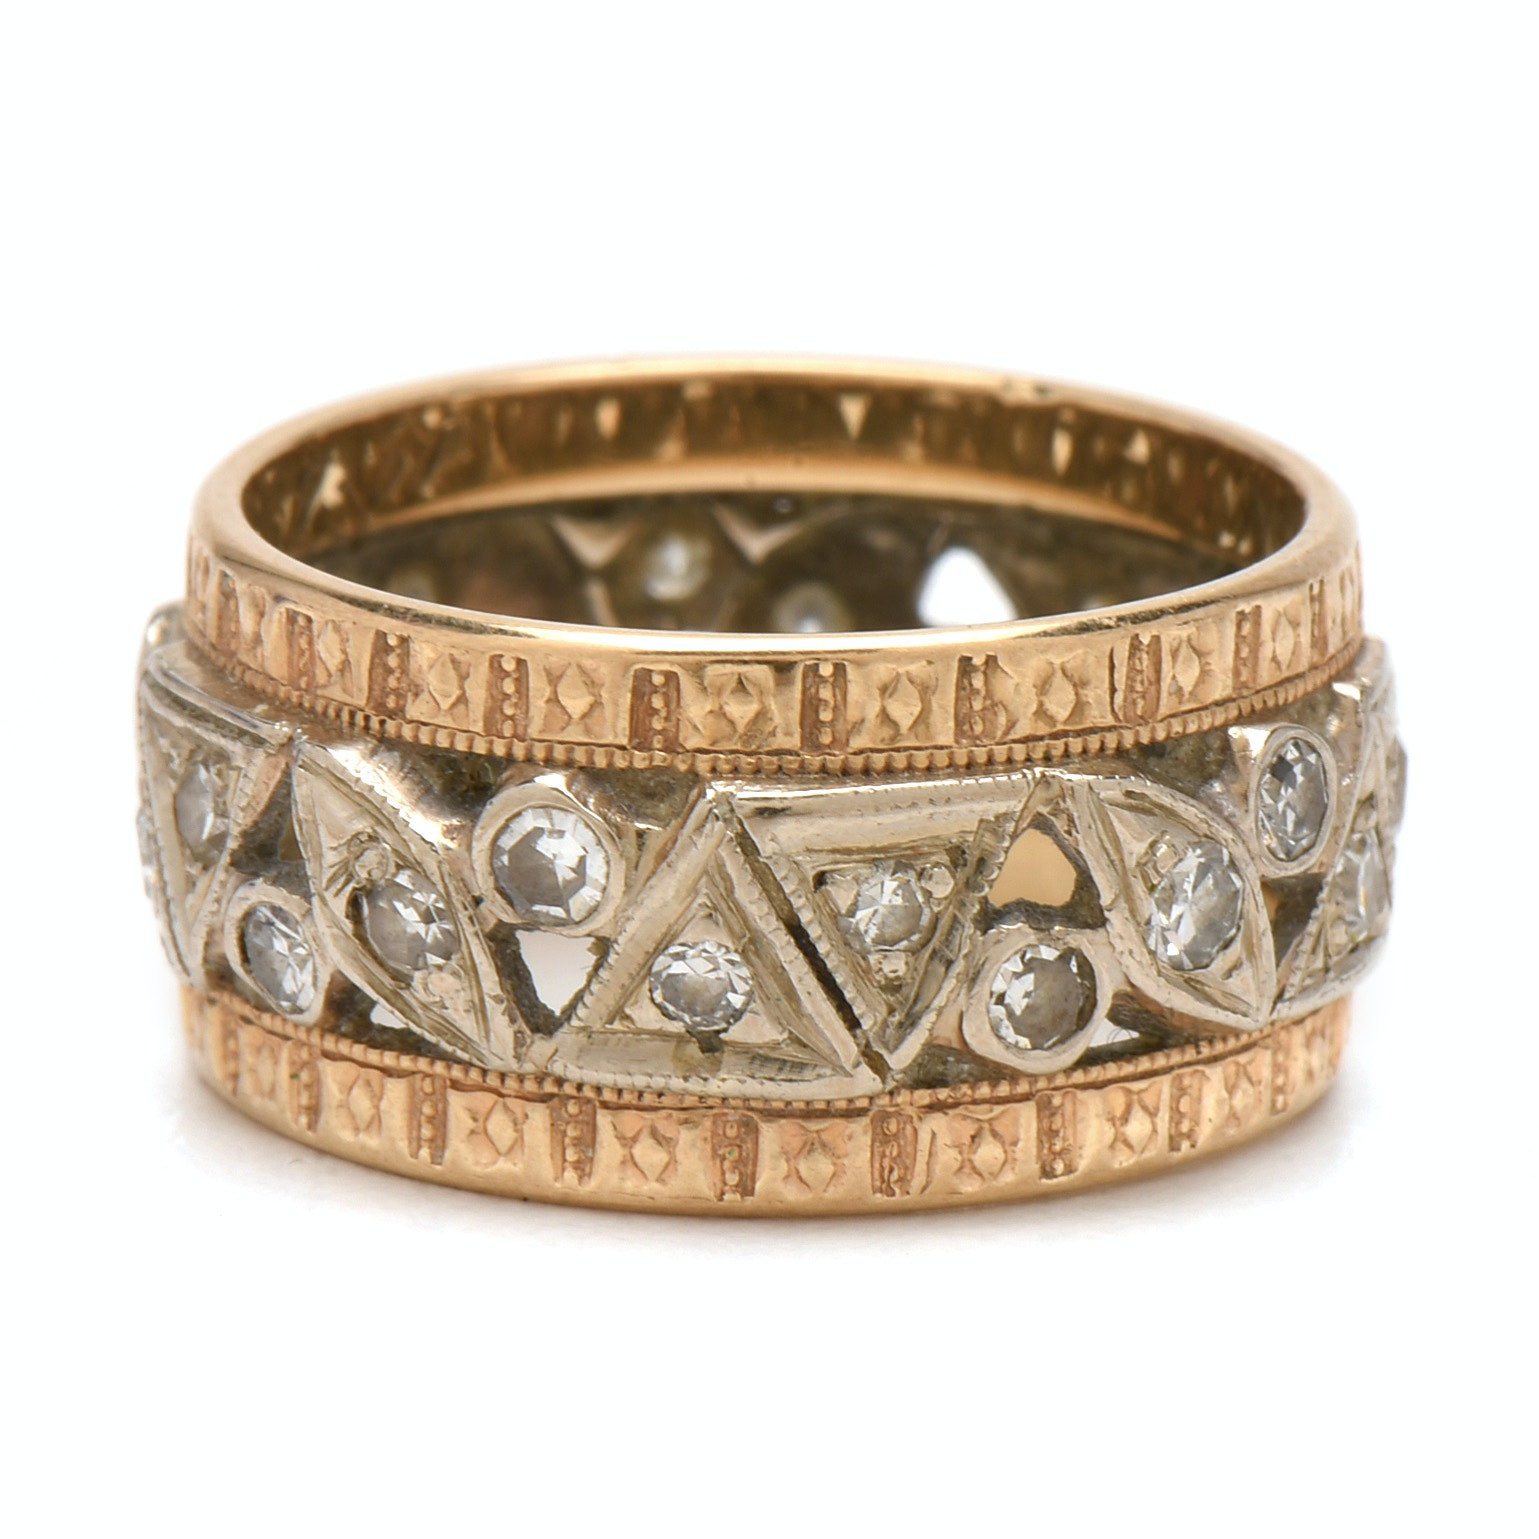 Retro Period 14K Two-Tone Diamond Cigar Band Ring